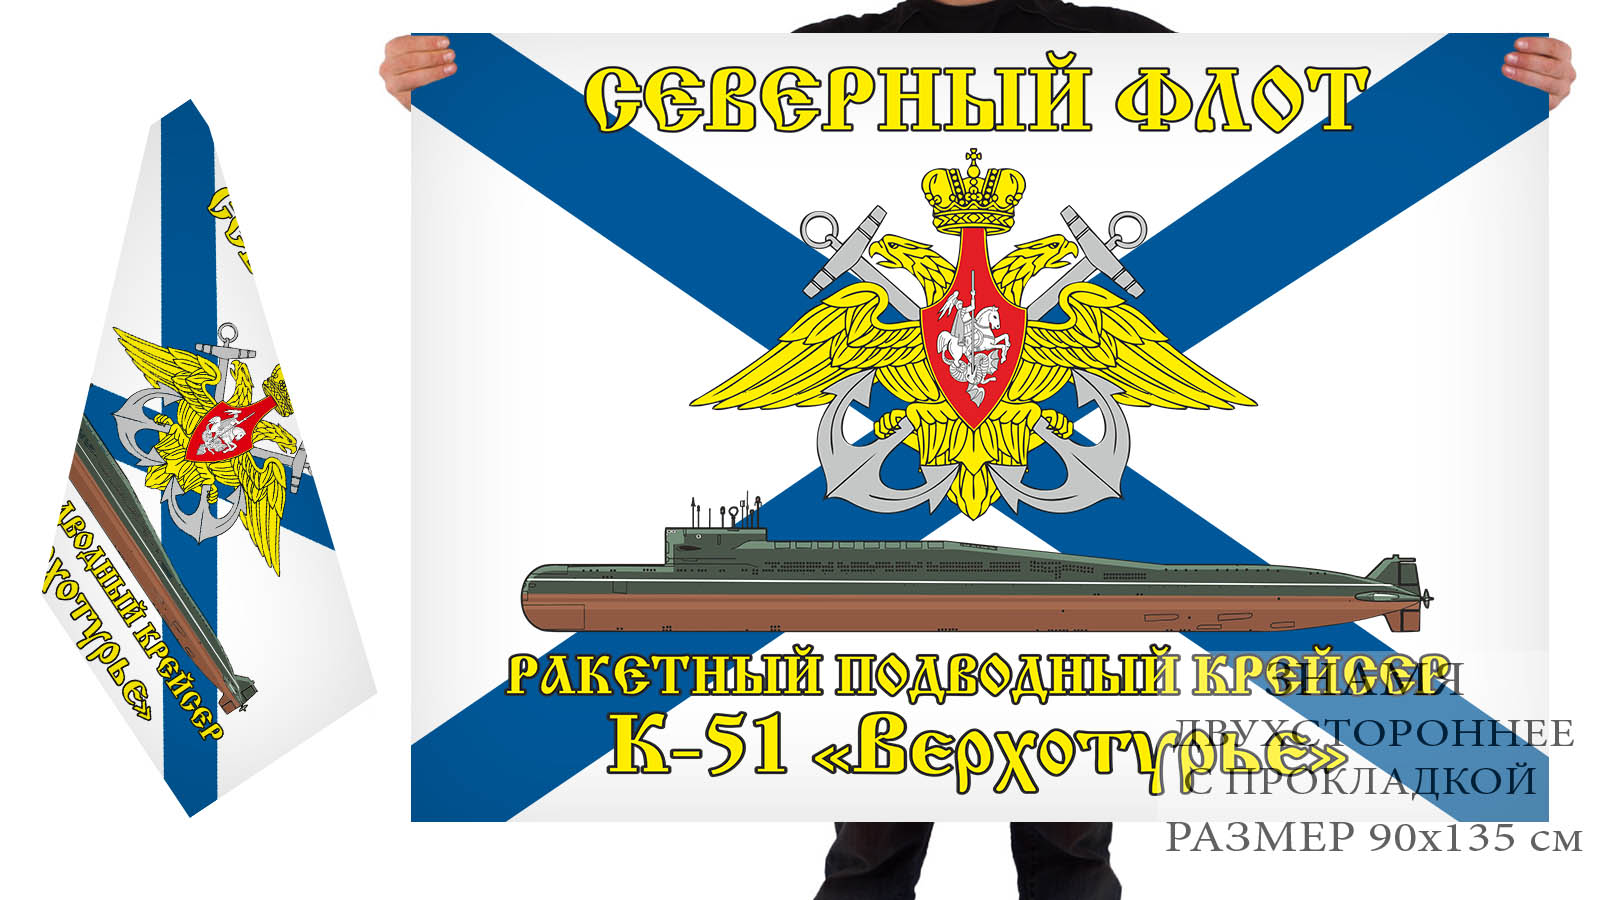 Двусторонний флаг РПКСН К 51 Верхотурье